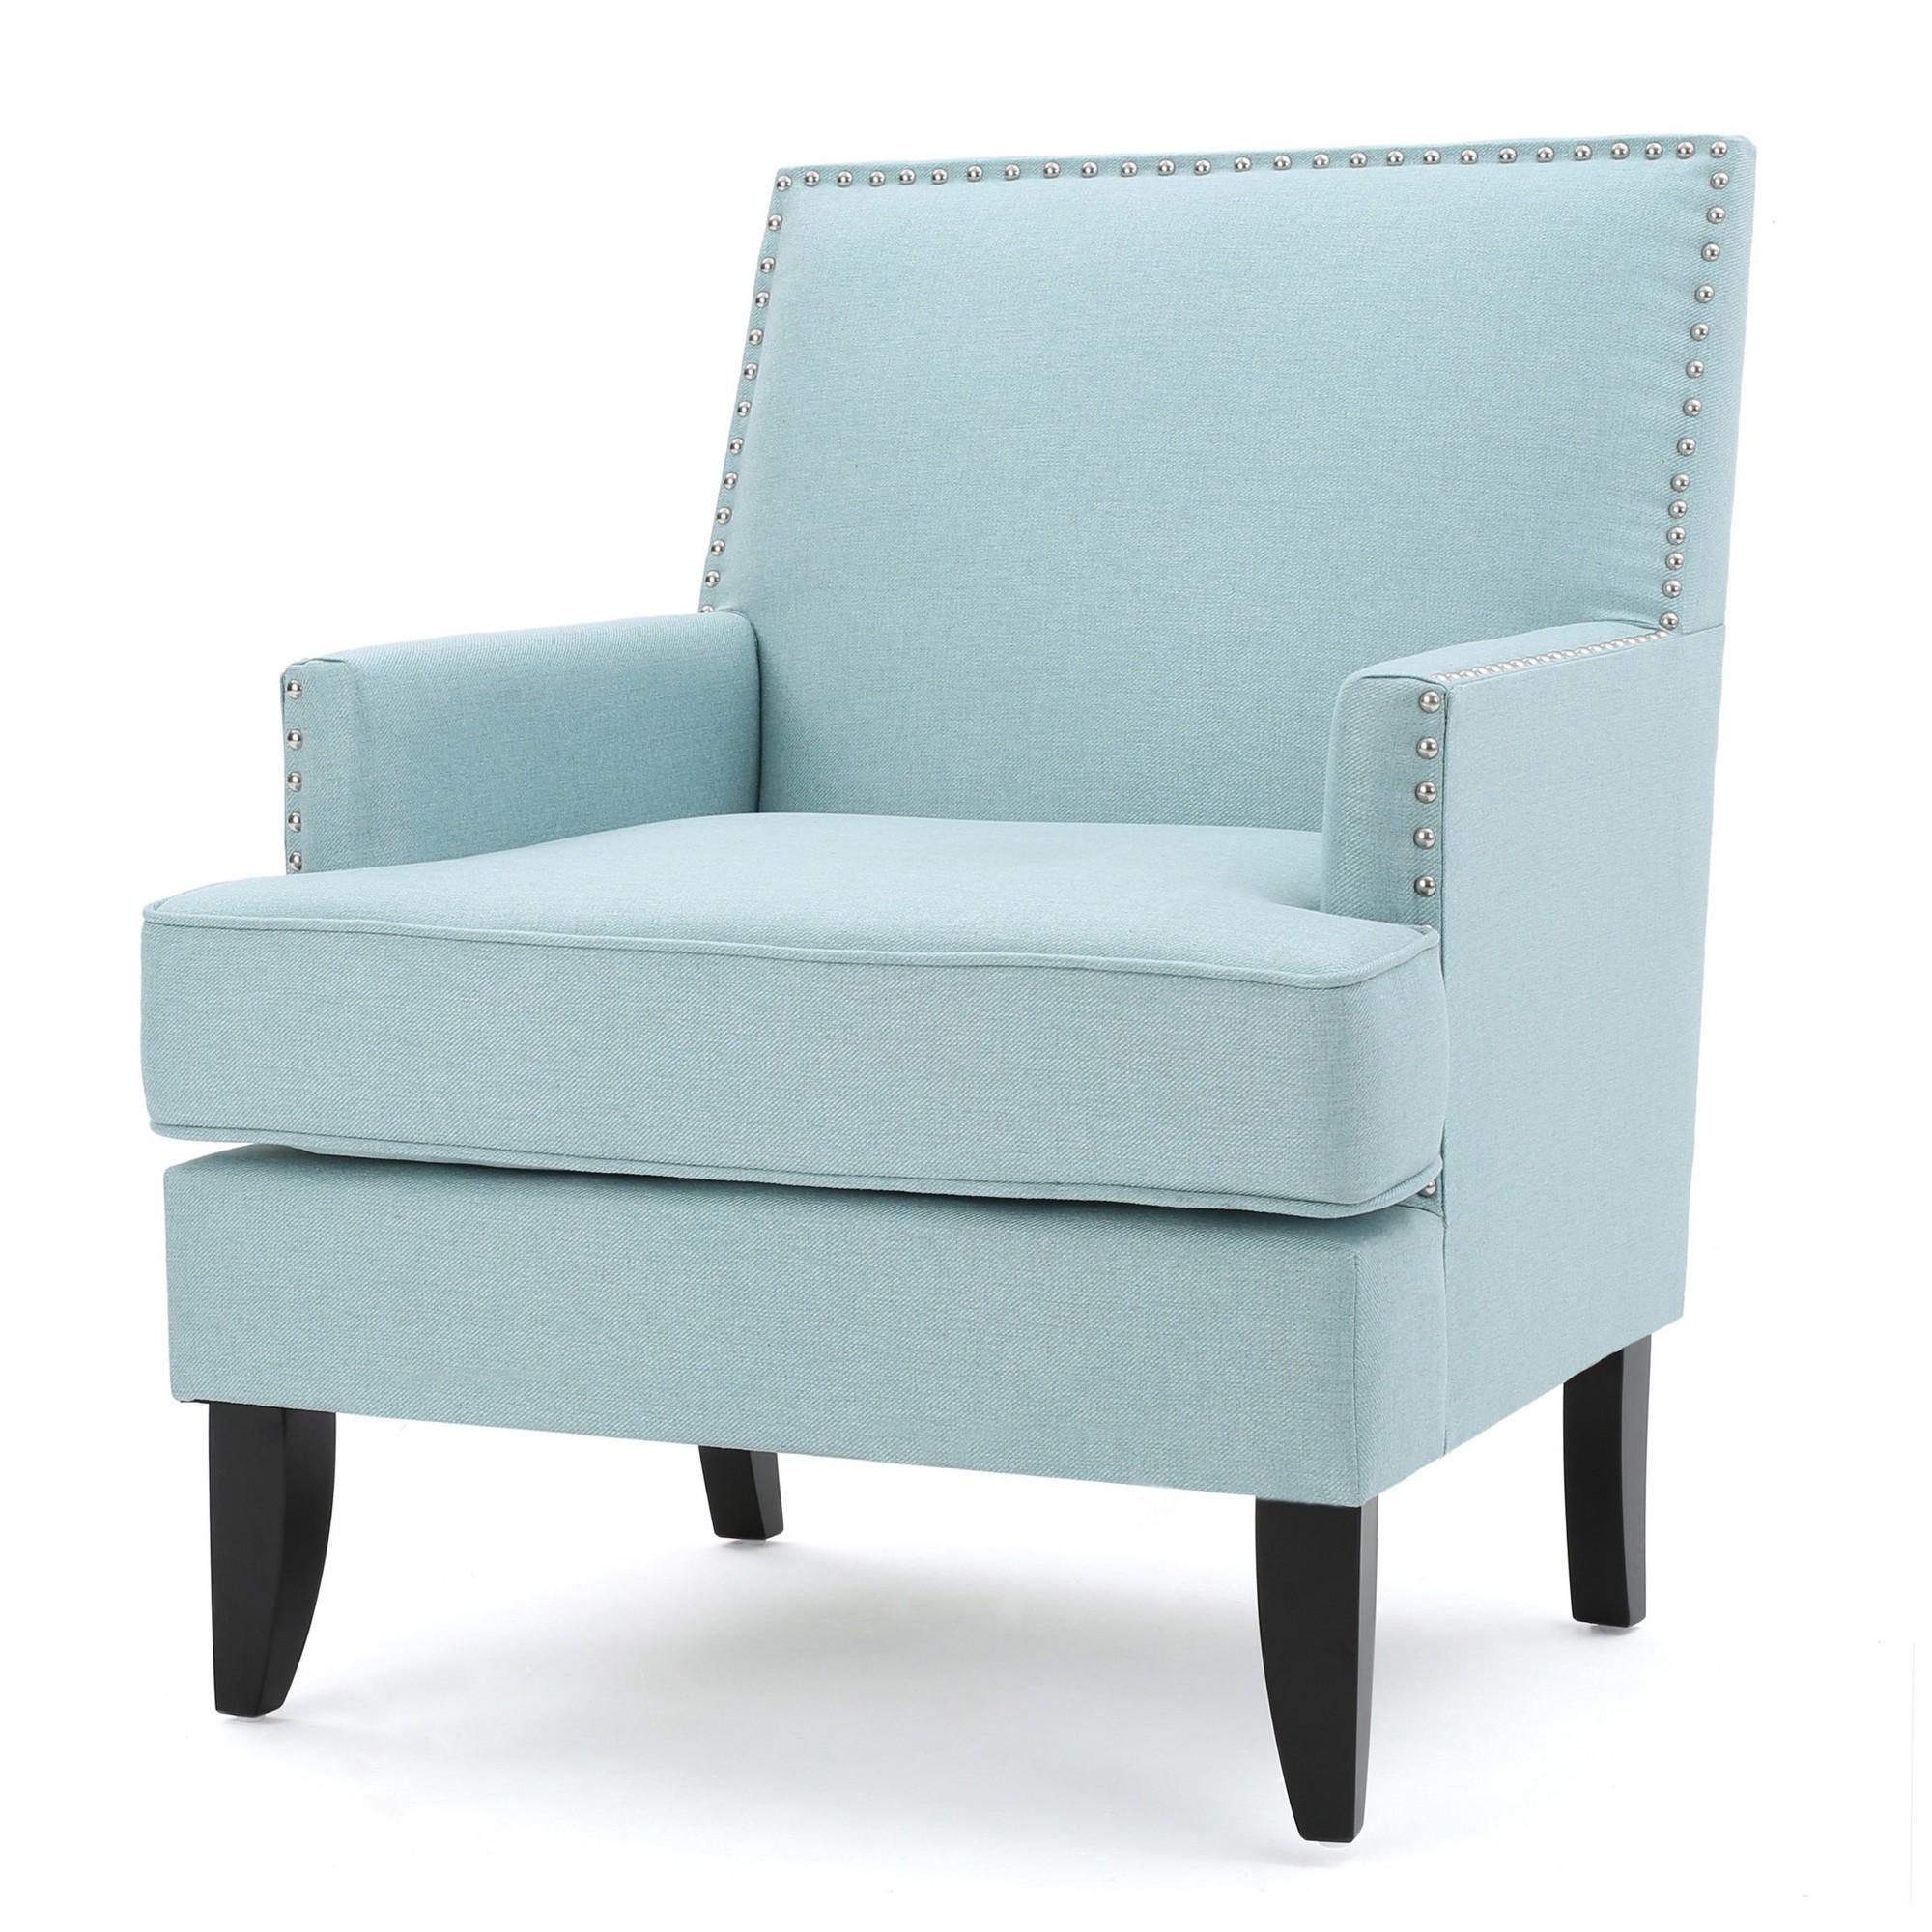 Tilla Club Chair Light Blue Christopher Knight Home Club